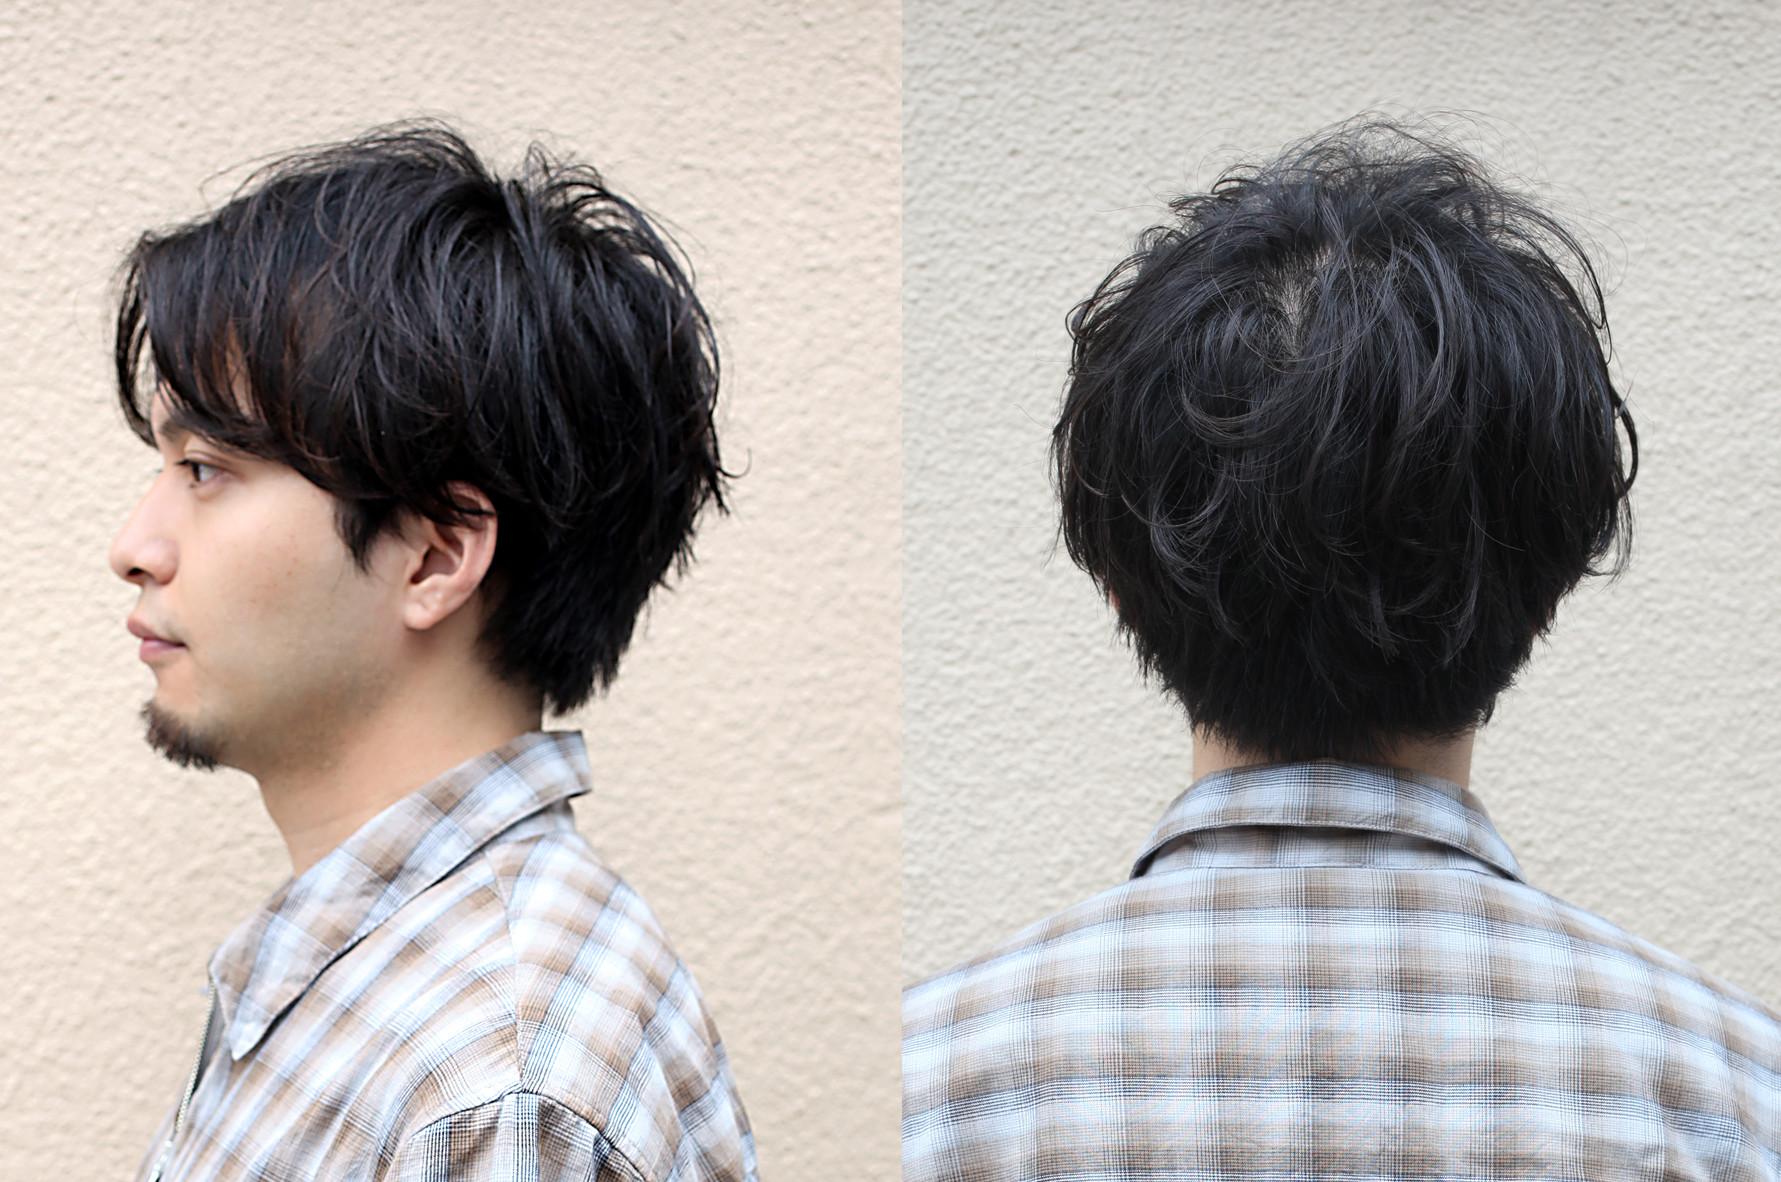 Avenz.foundation 青山 清志さんスタイル:サイドバック